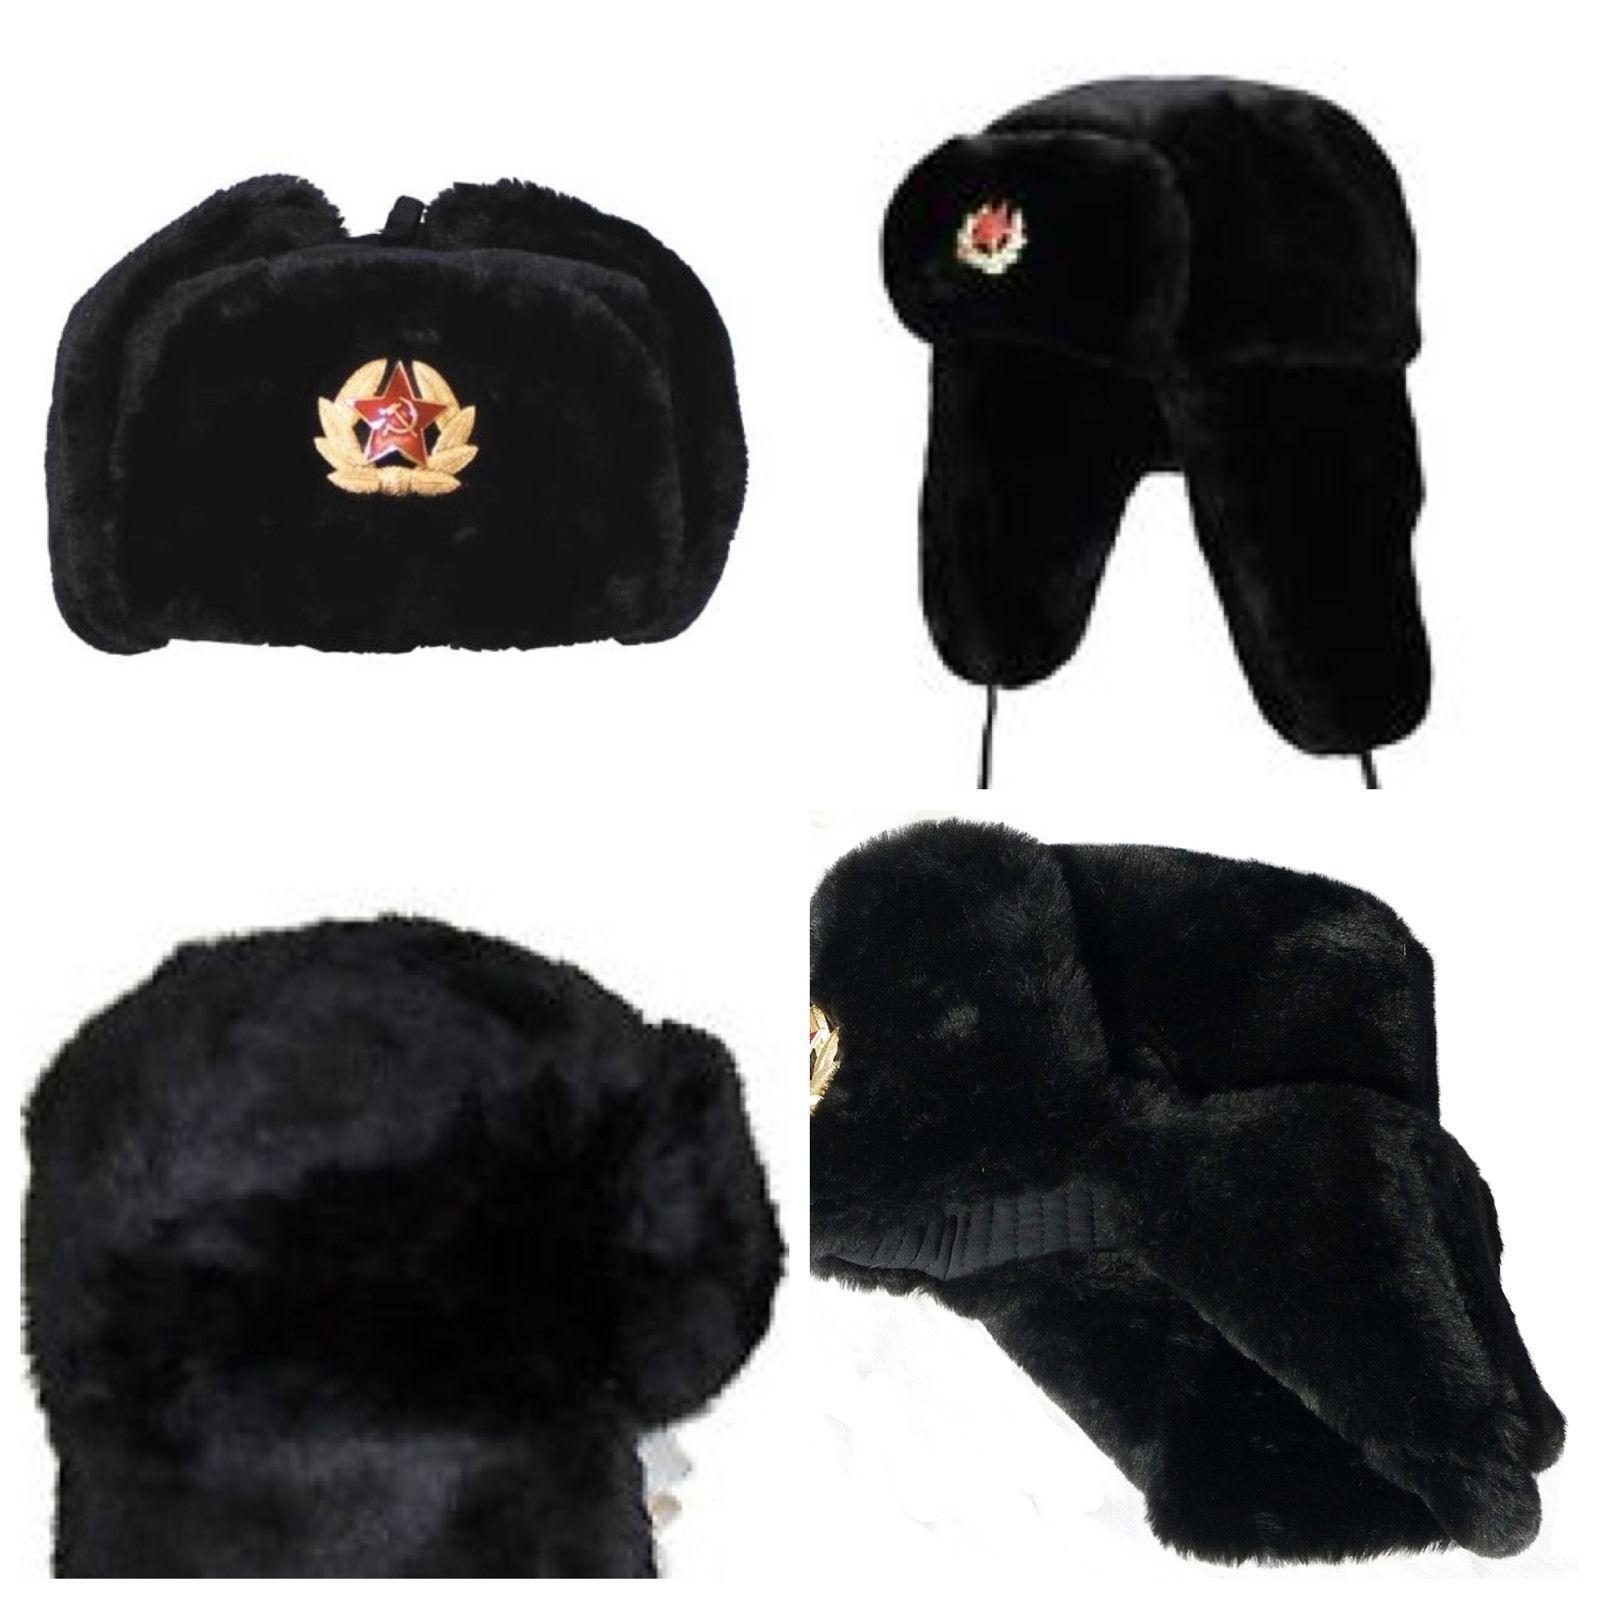 Russisch Trapper-Hut Kappe Sowjet Abzeichen Kunstpelz Ushanka Kosake Klappen